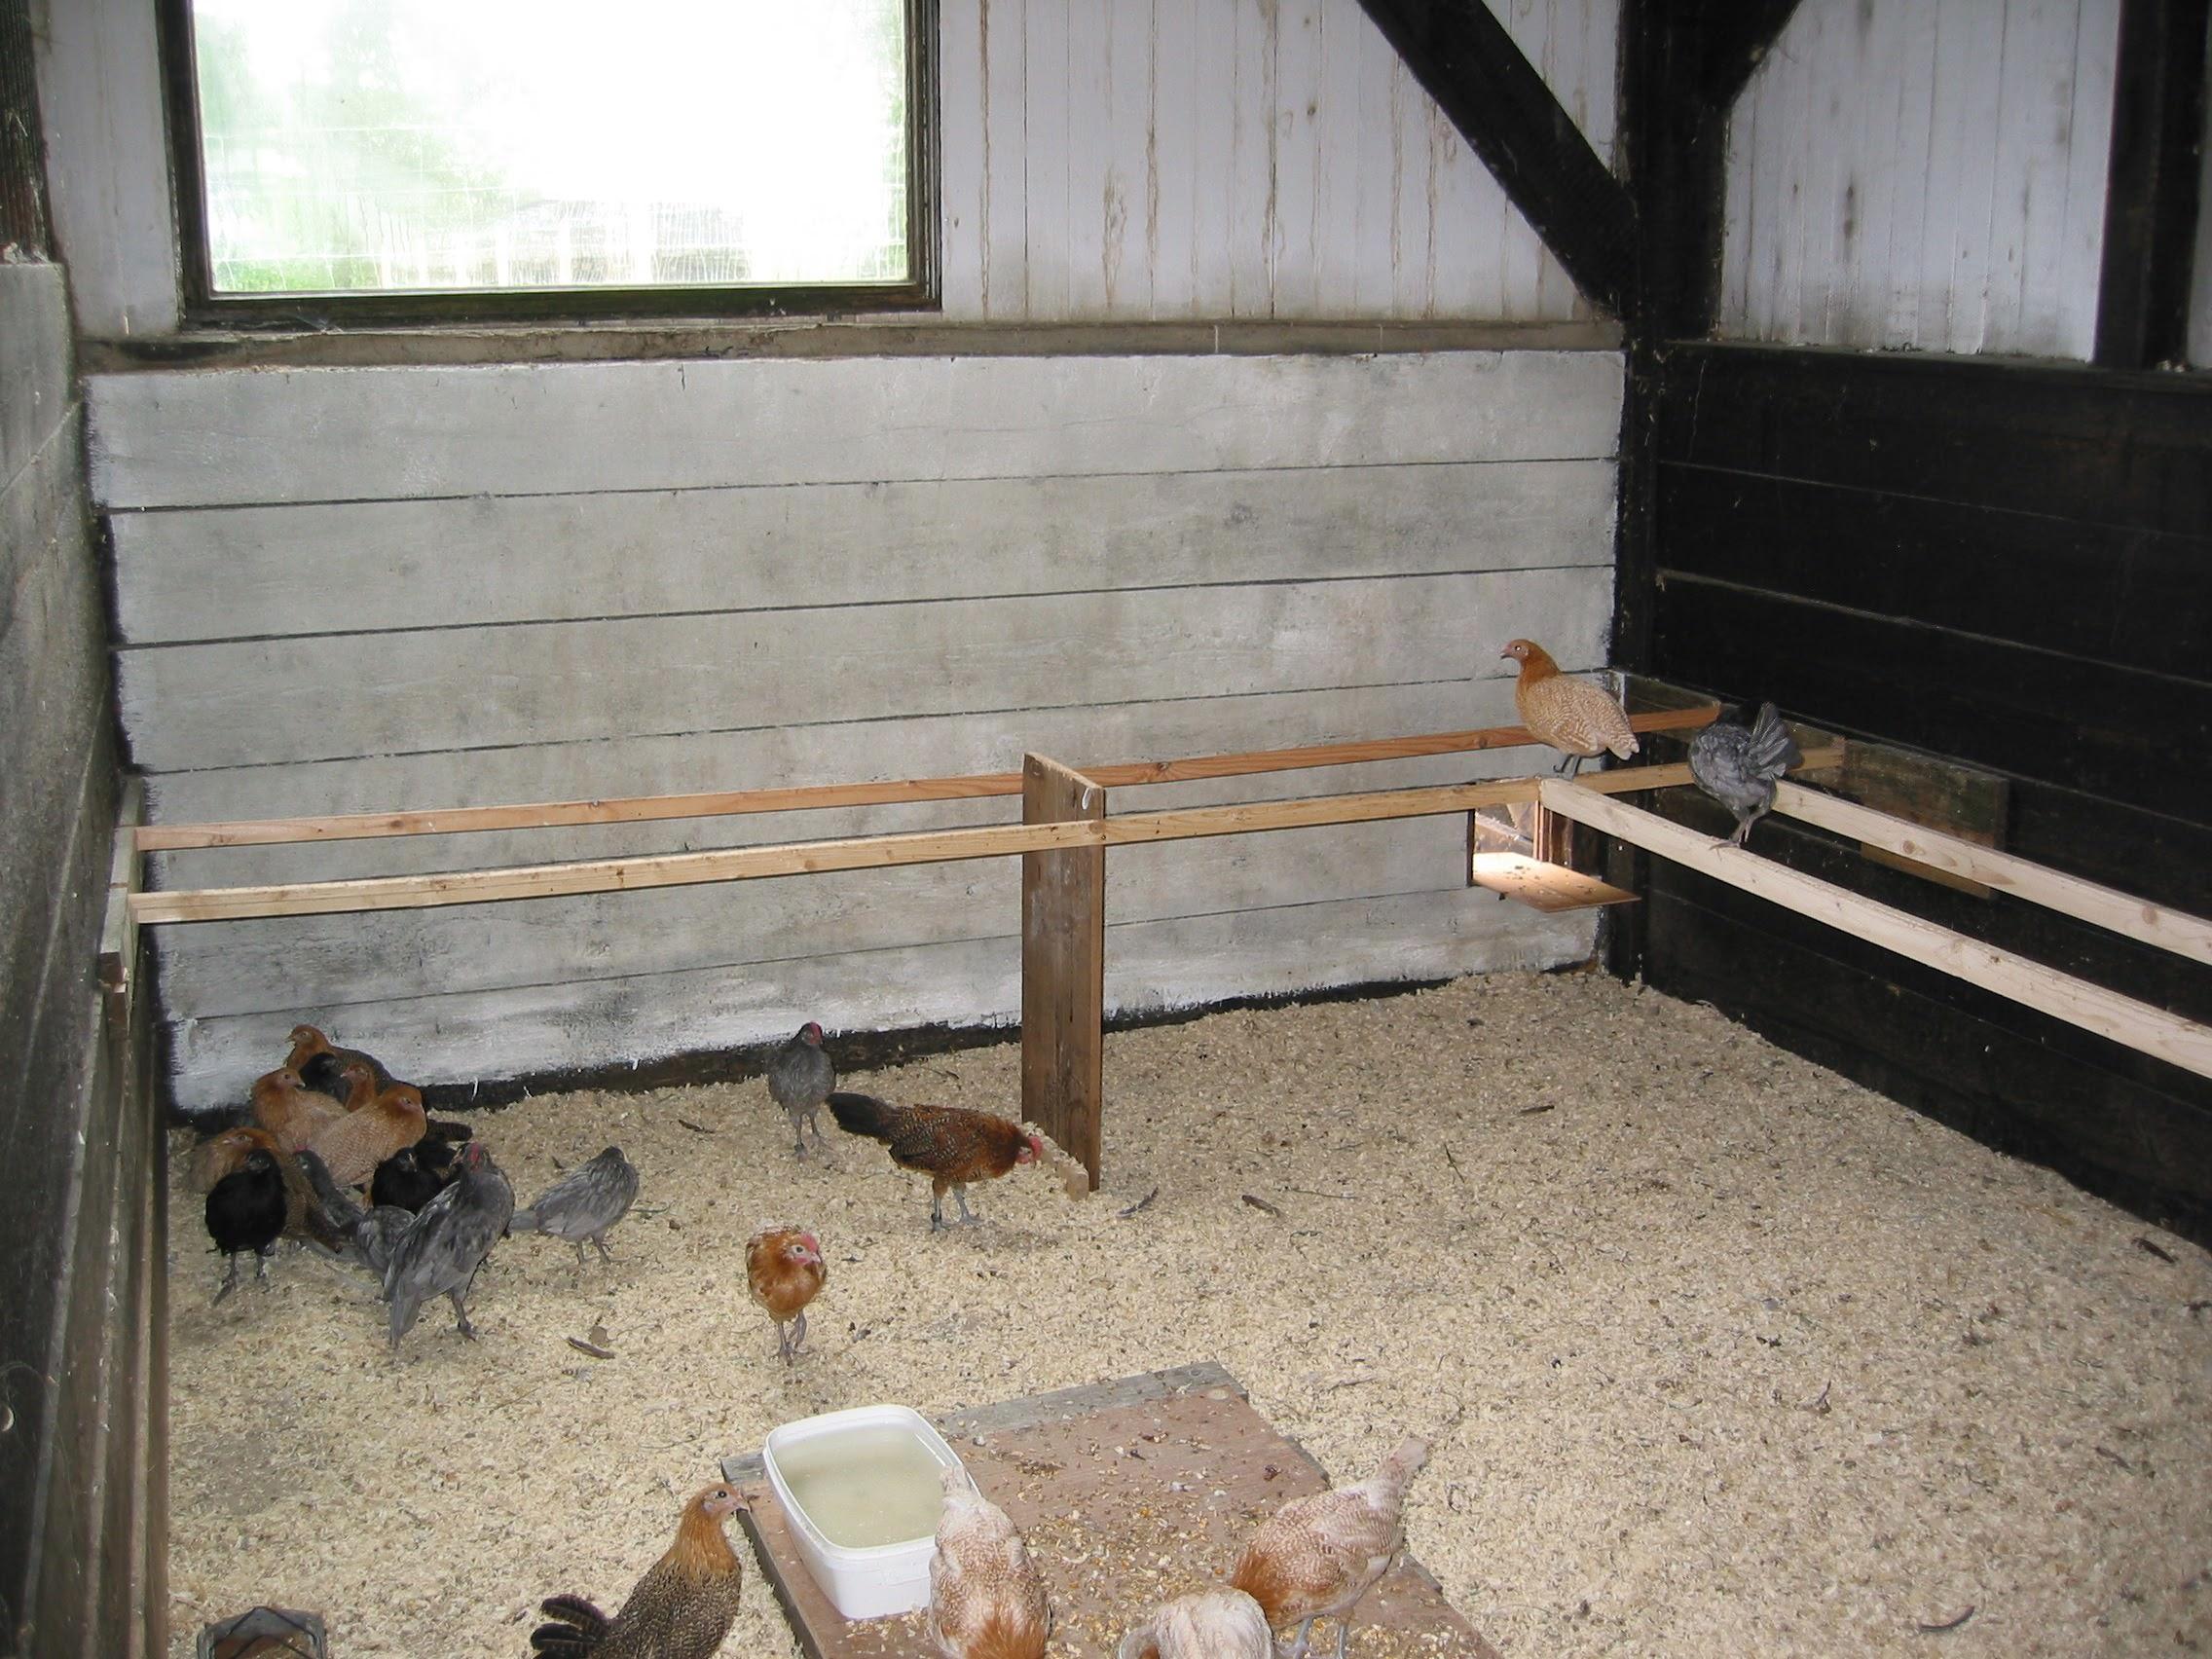 hühner im stall - fotos